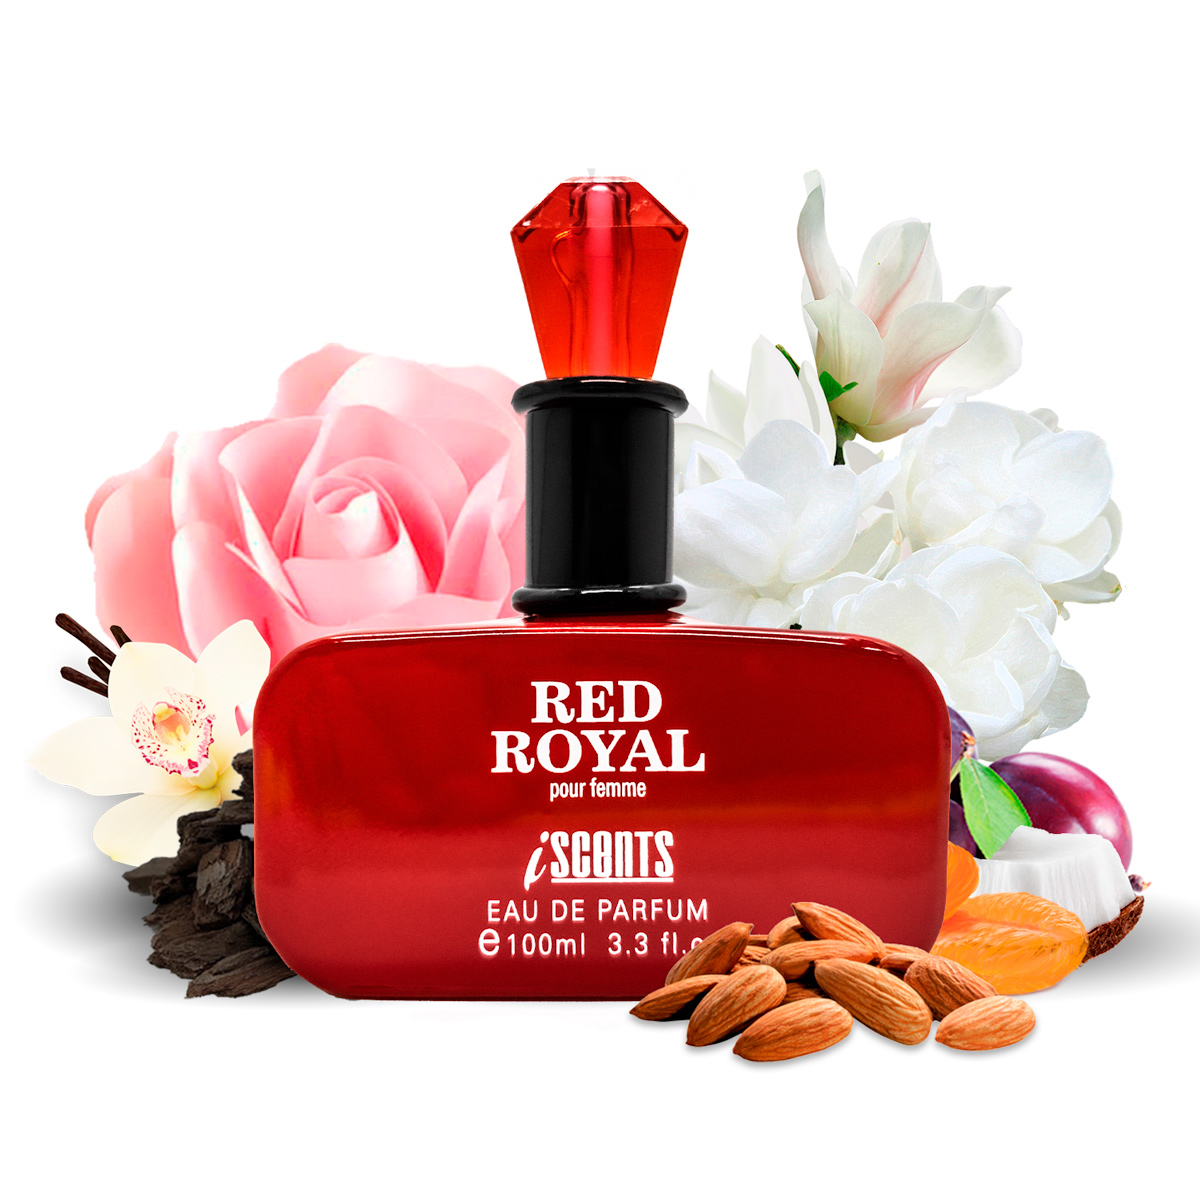 Kit 2 Perfumes Importados Fantasia e Red Royal I Scents